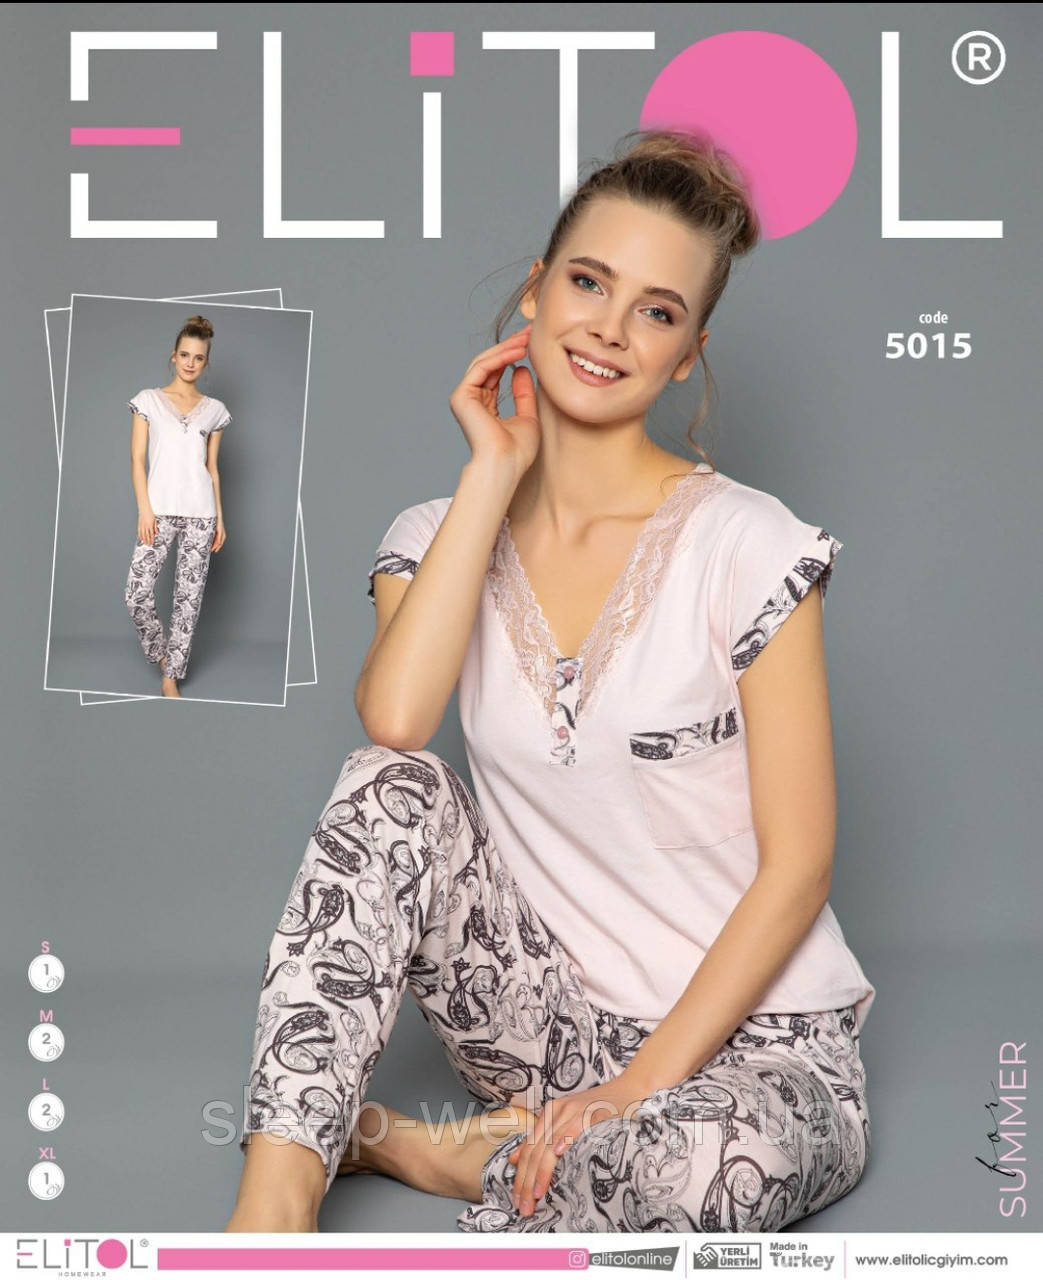 Піжама для дівчат,ELITOL 5015